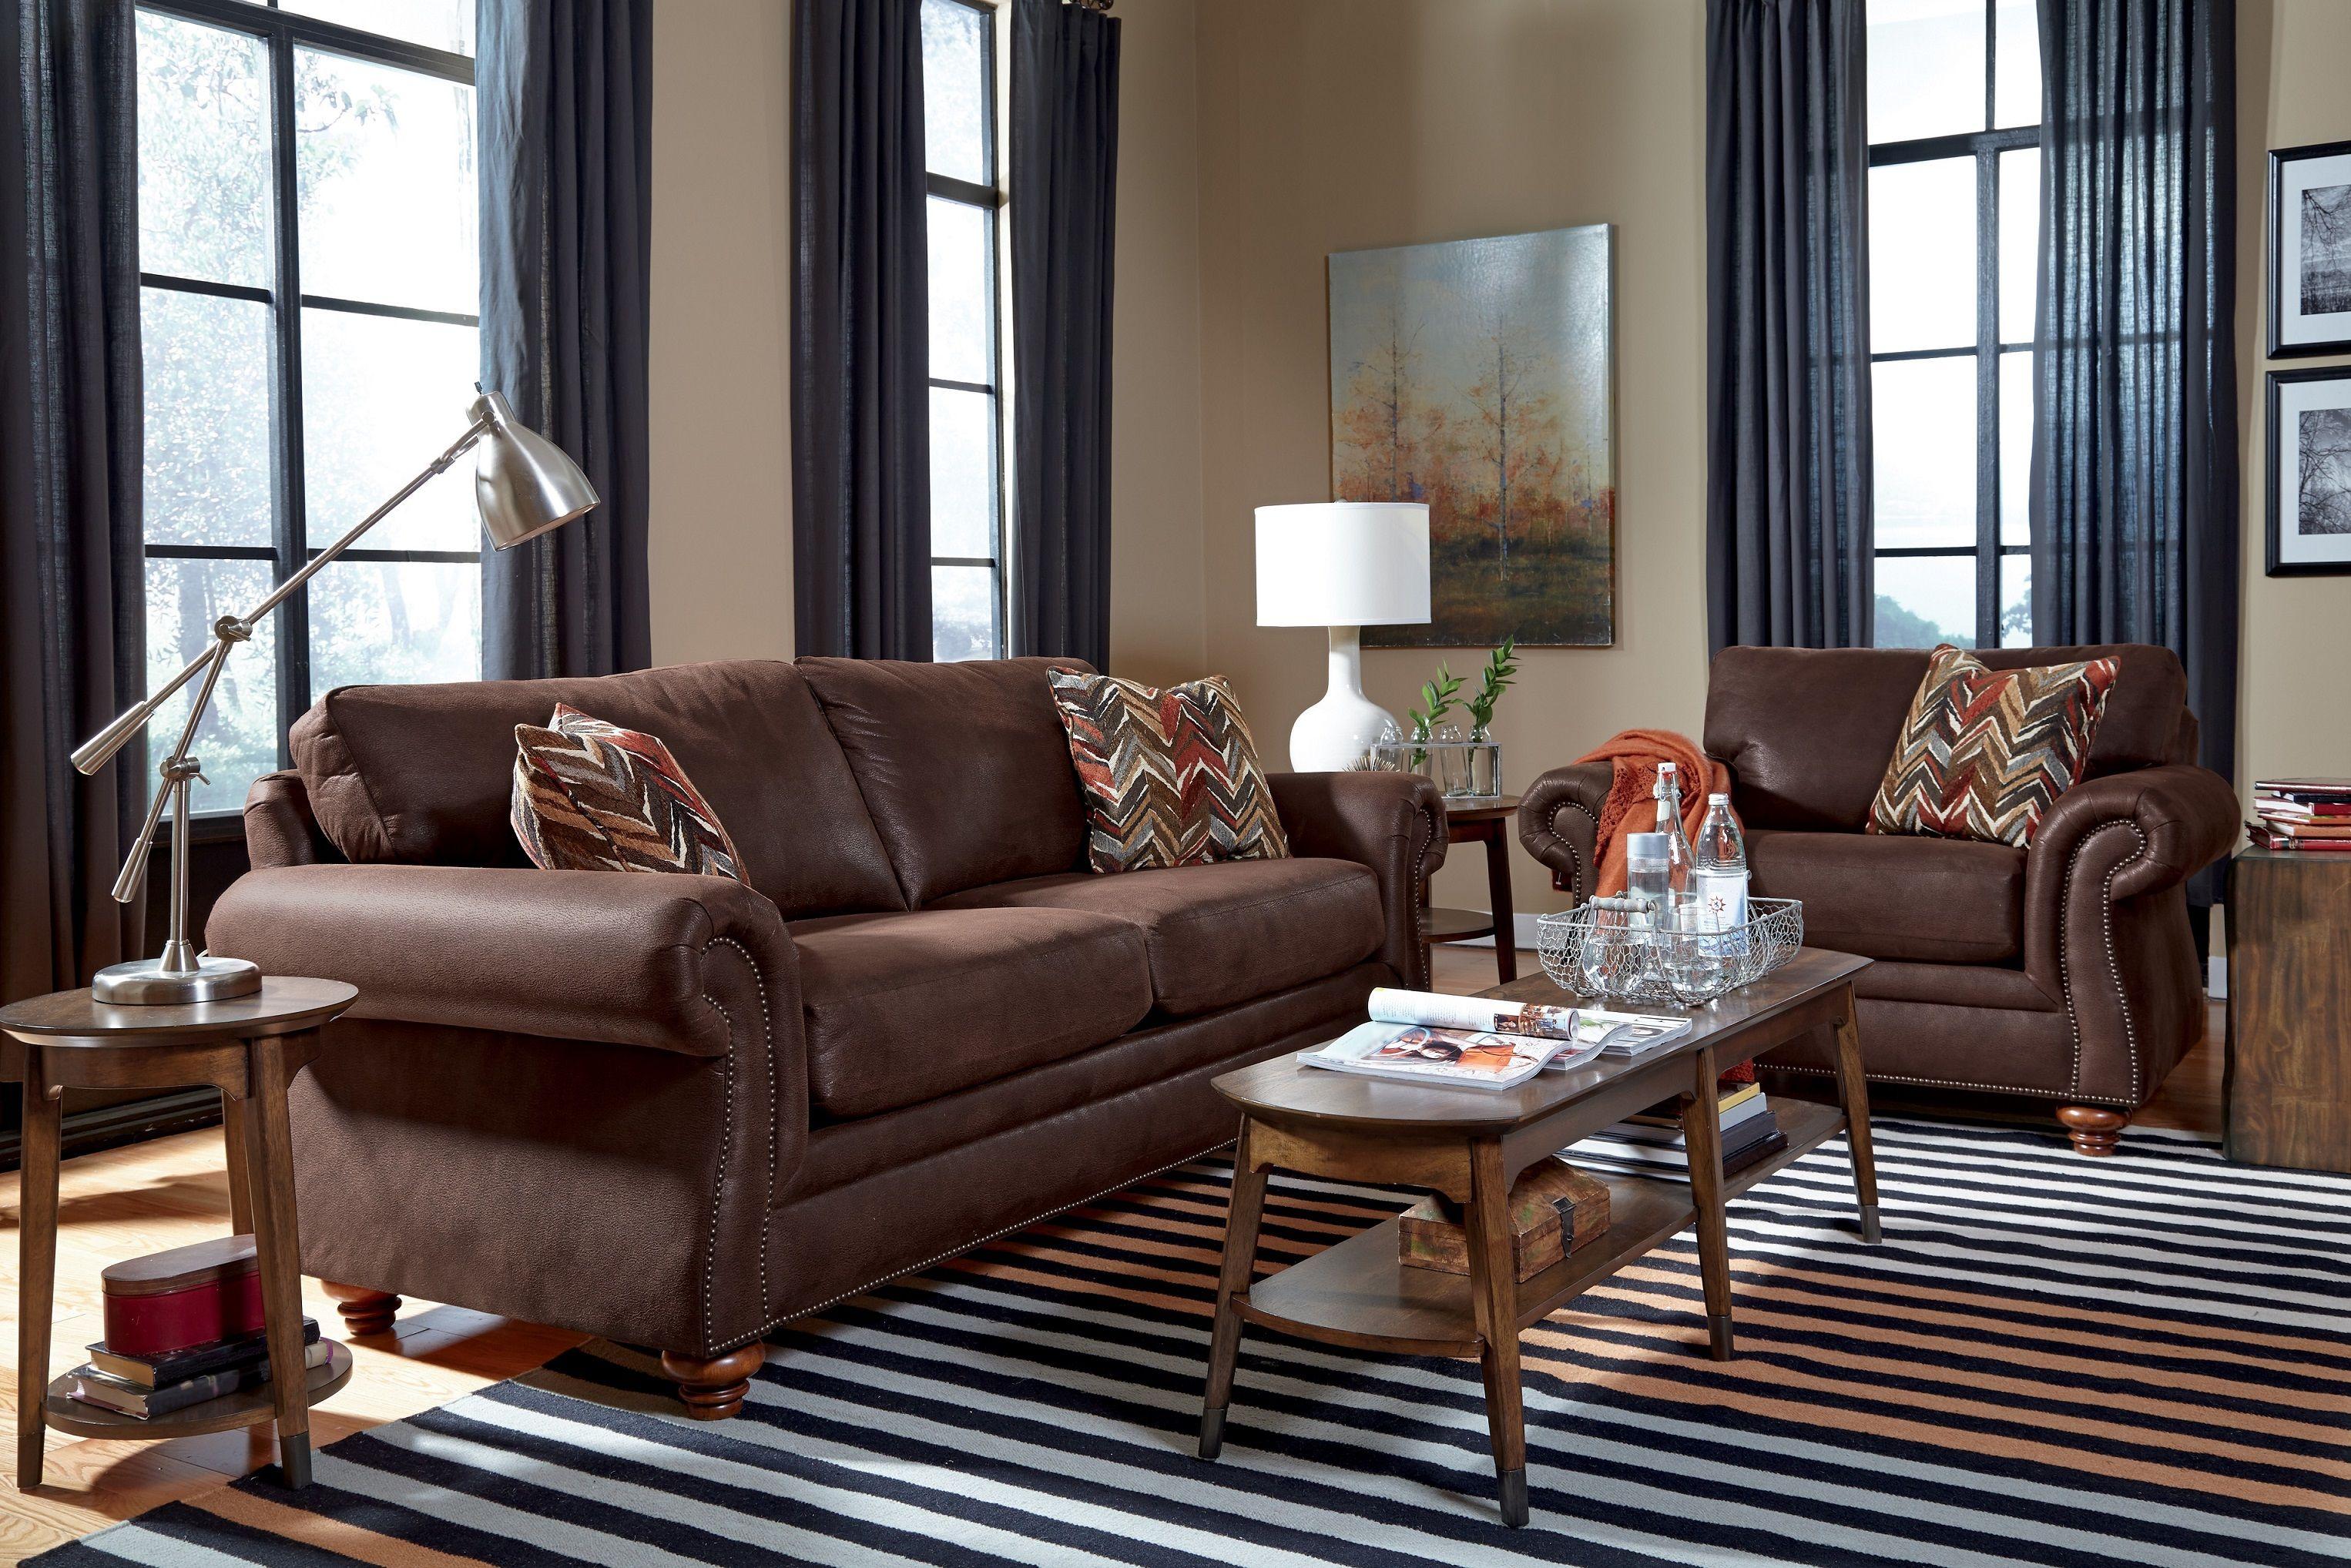 Dexter Drummond Living Room Set By Flexsteel At Crowley Furniture In